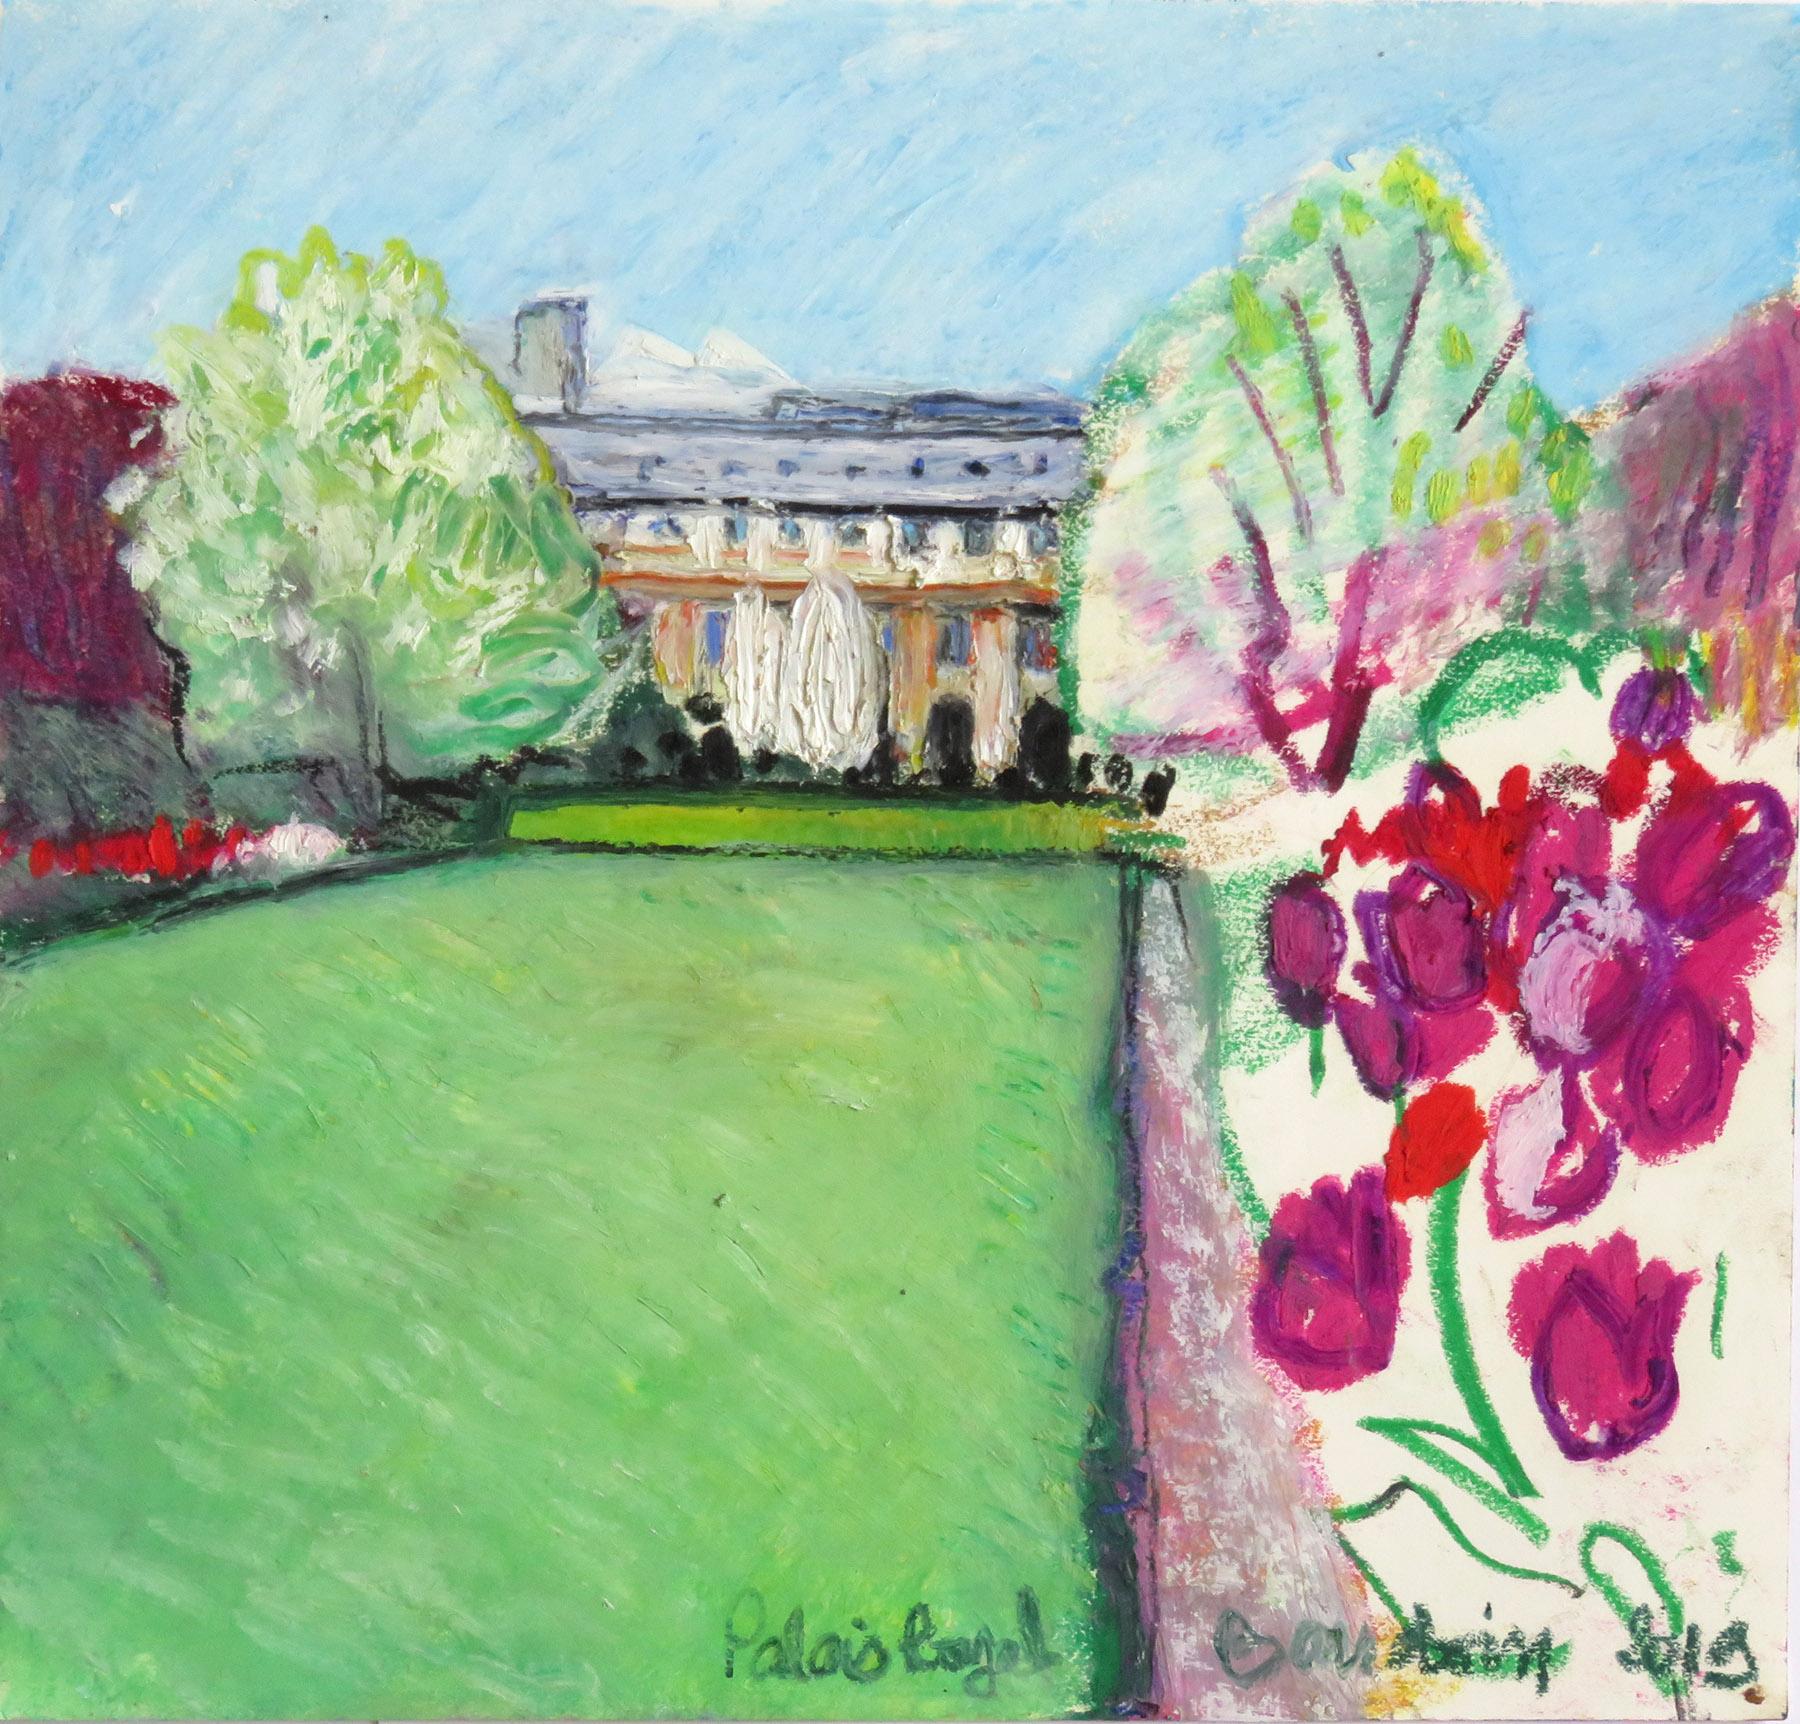 pastel gras le Palais Royal 30 x 28,5